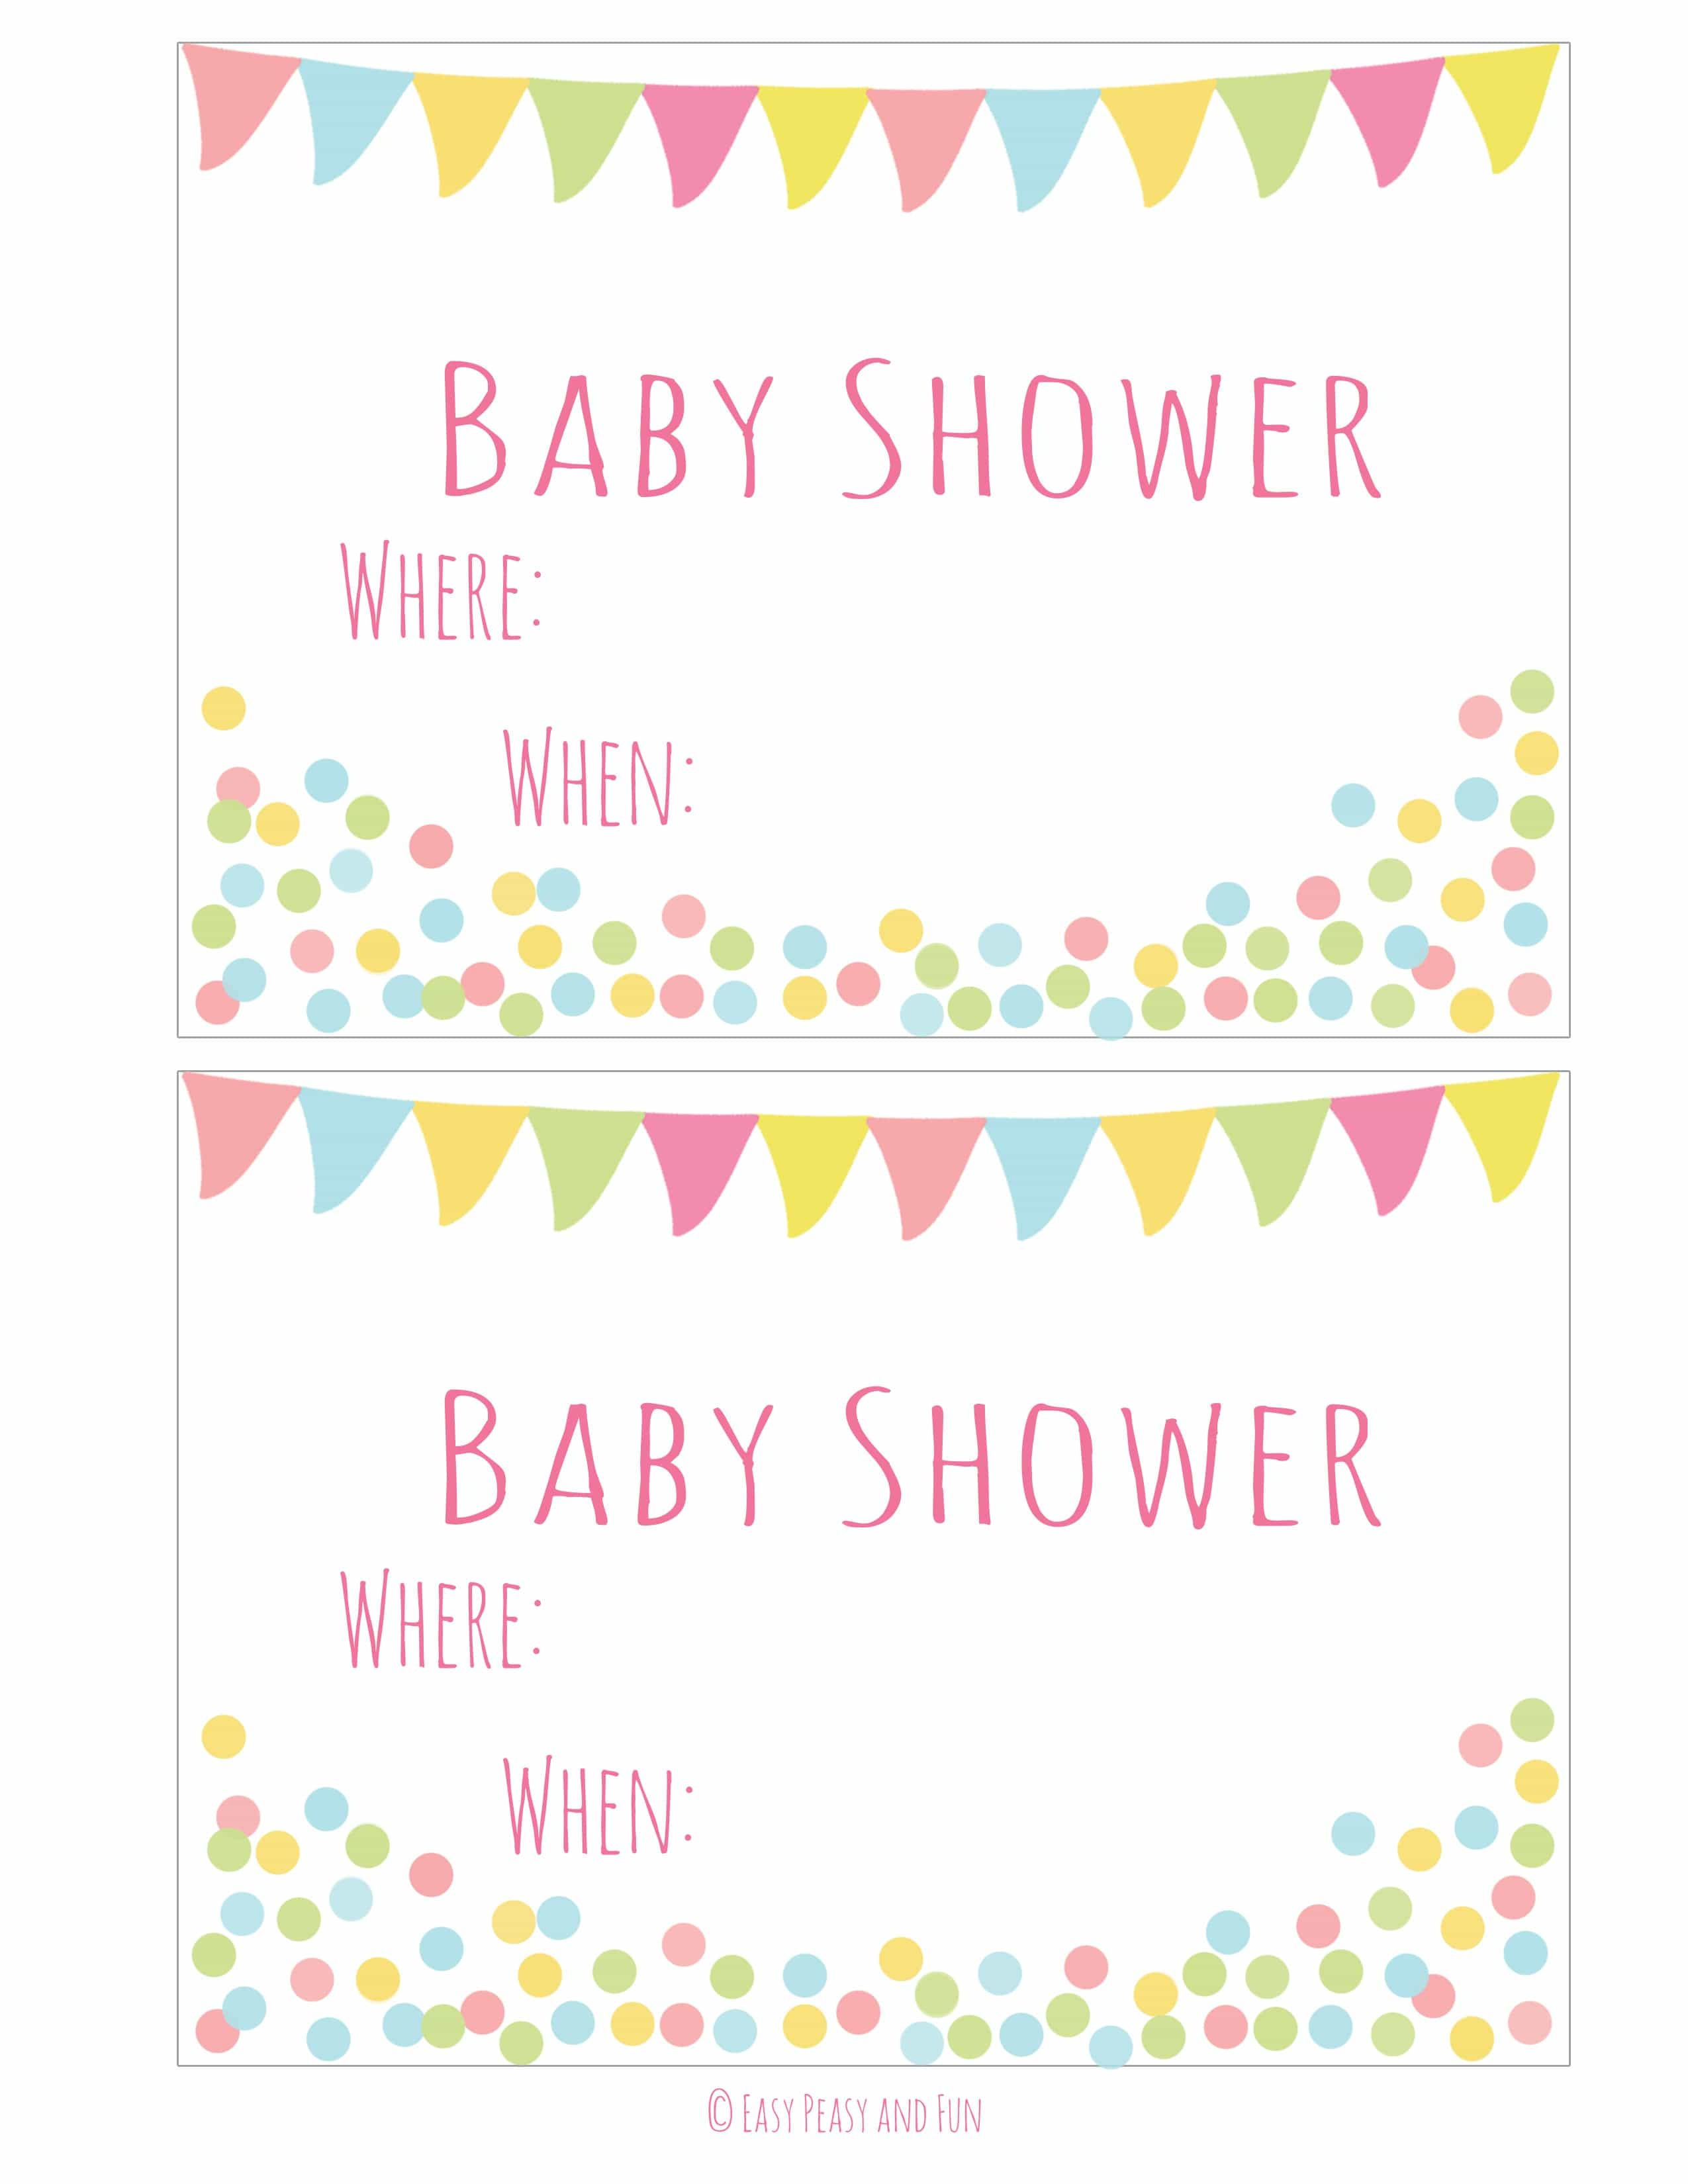 Free Printable Baby Shower Invitation - Easy Peasy And Fun - Free Printable Baby Shower Invitations For Boys